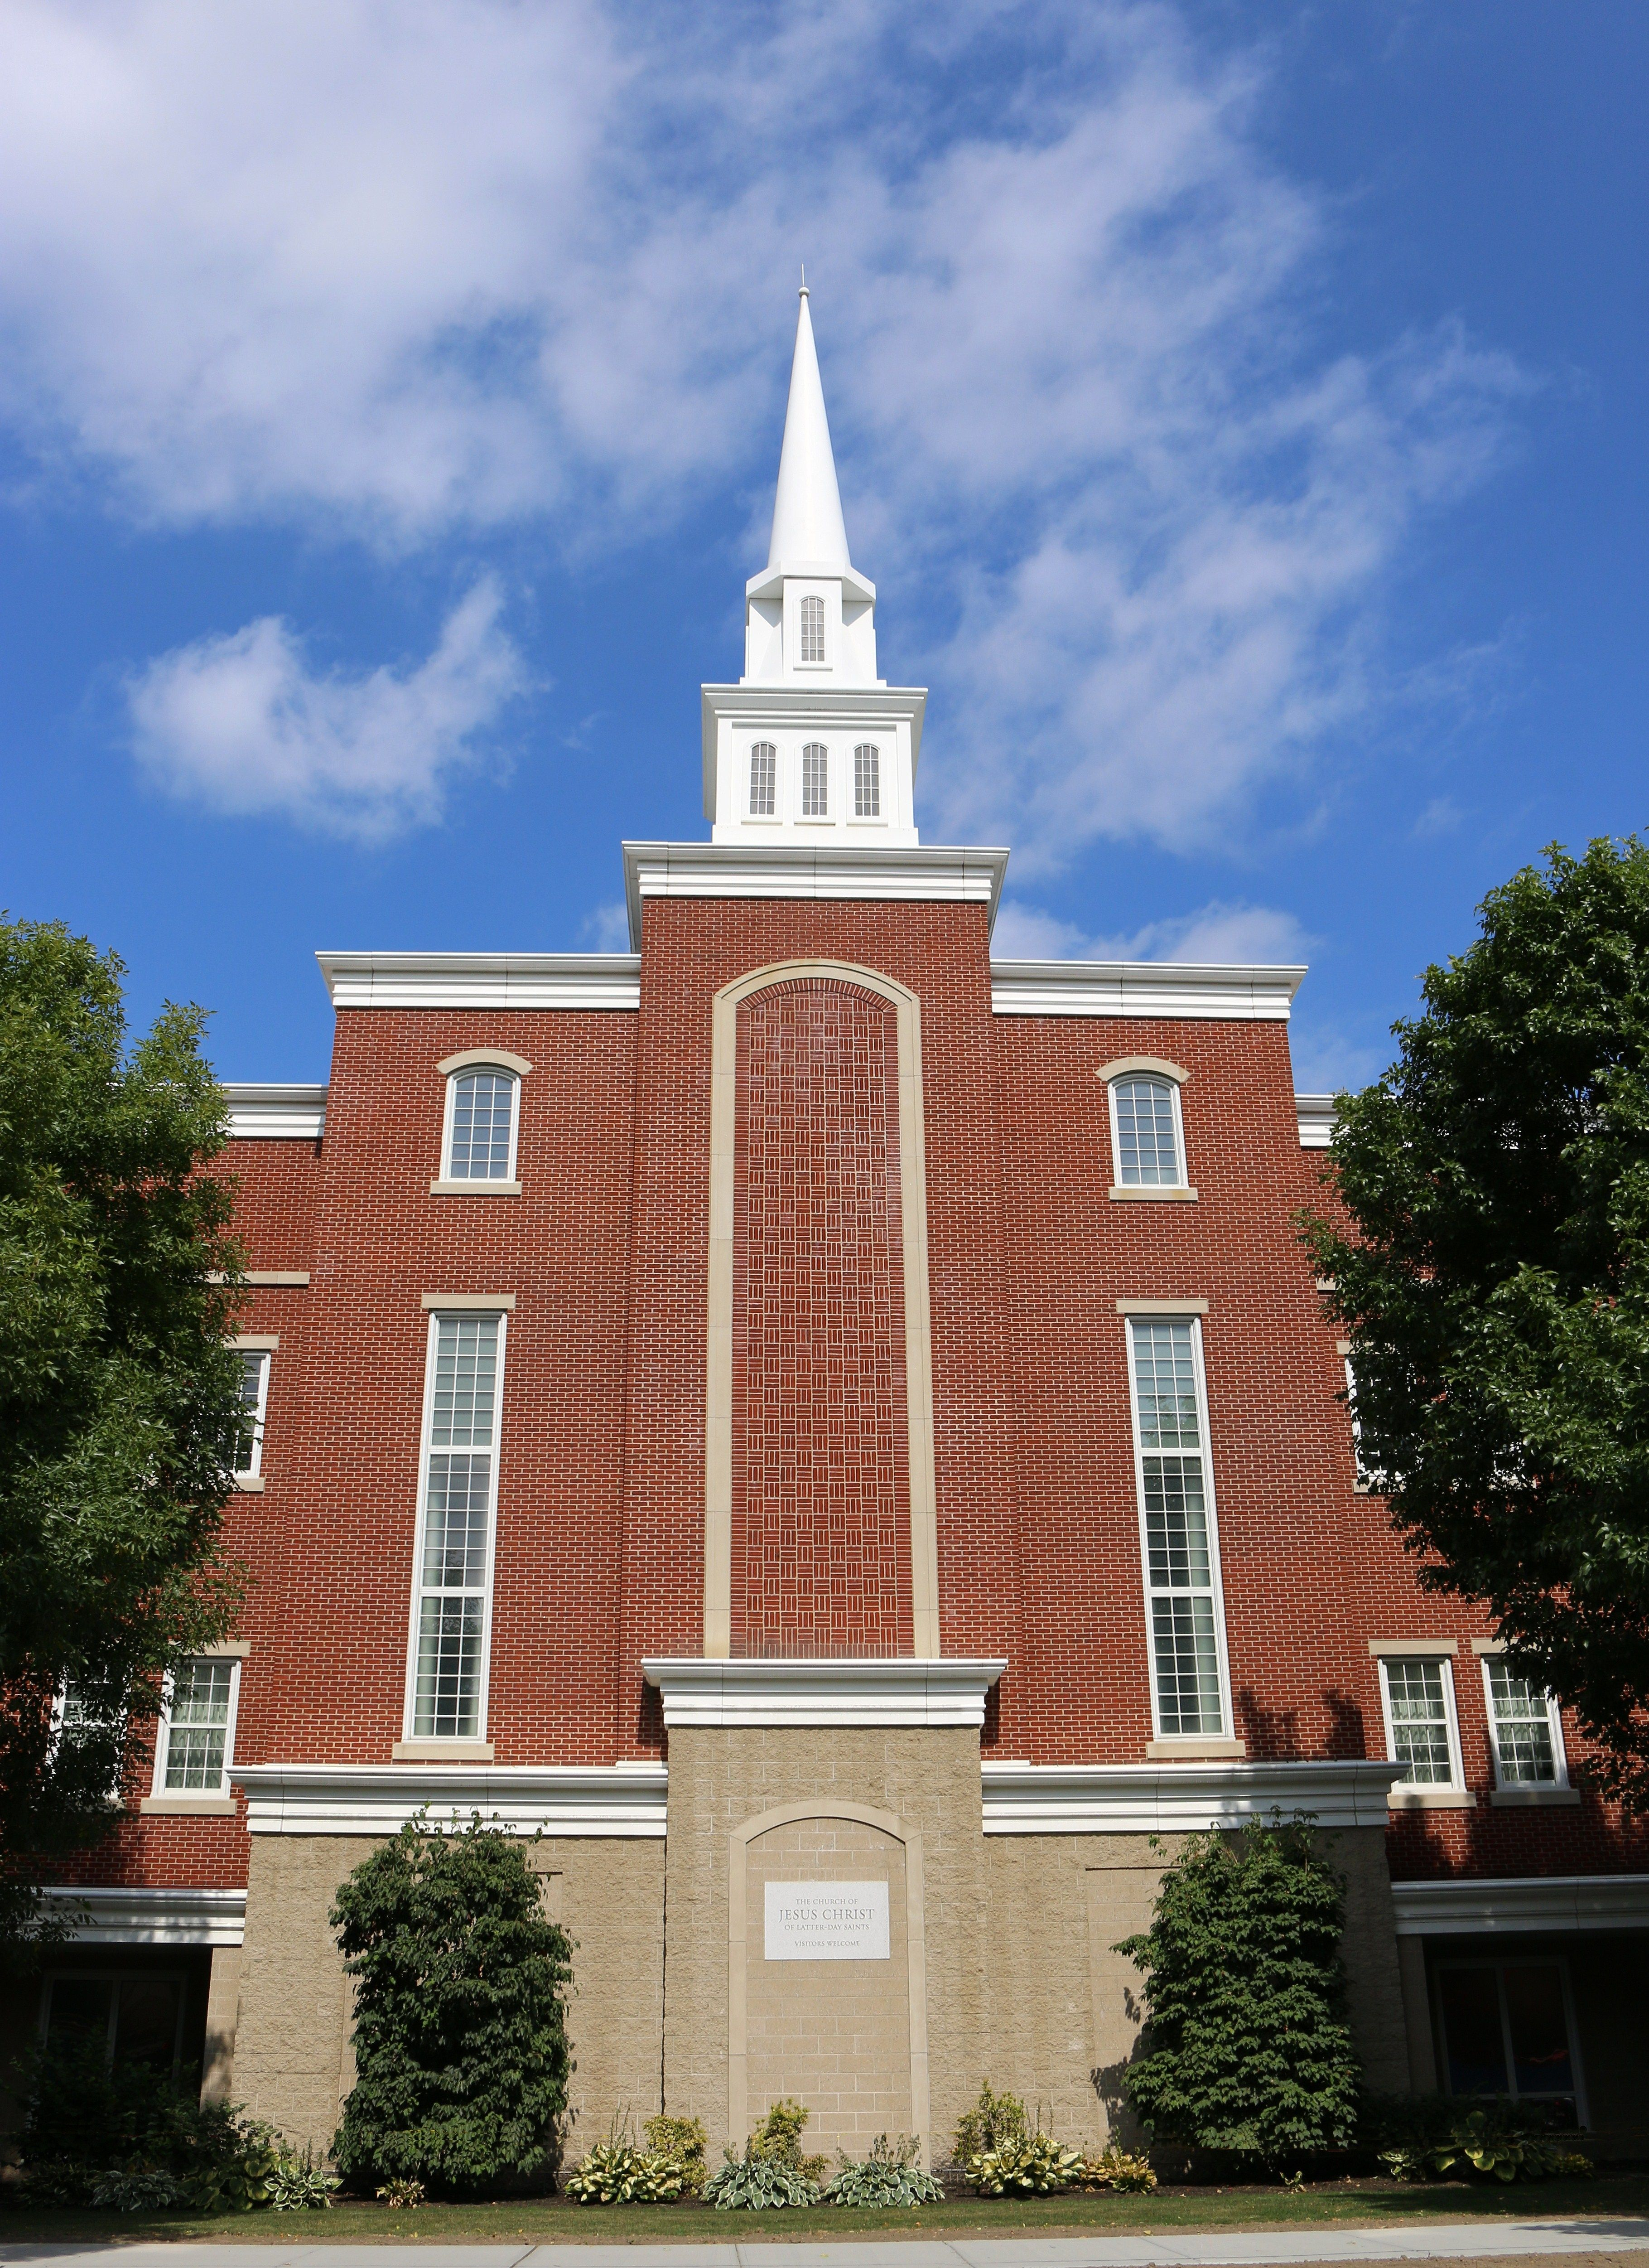 Front view of a Cambridge, Massachusetts, chapel.